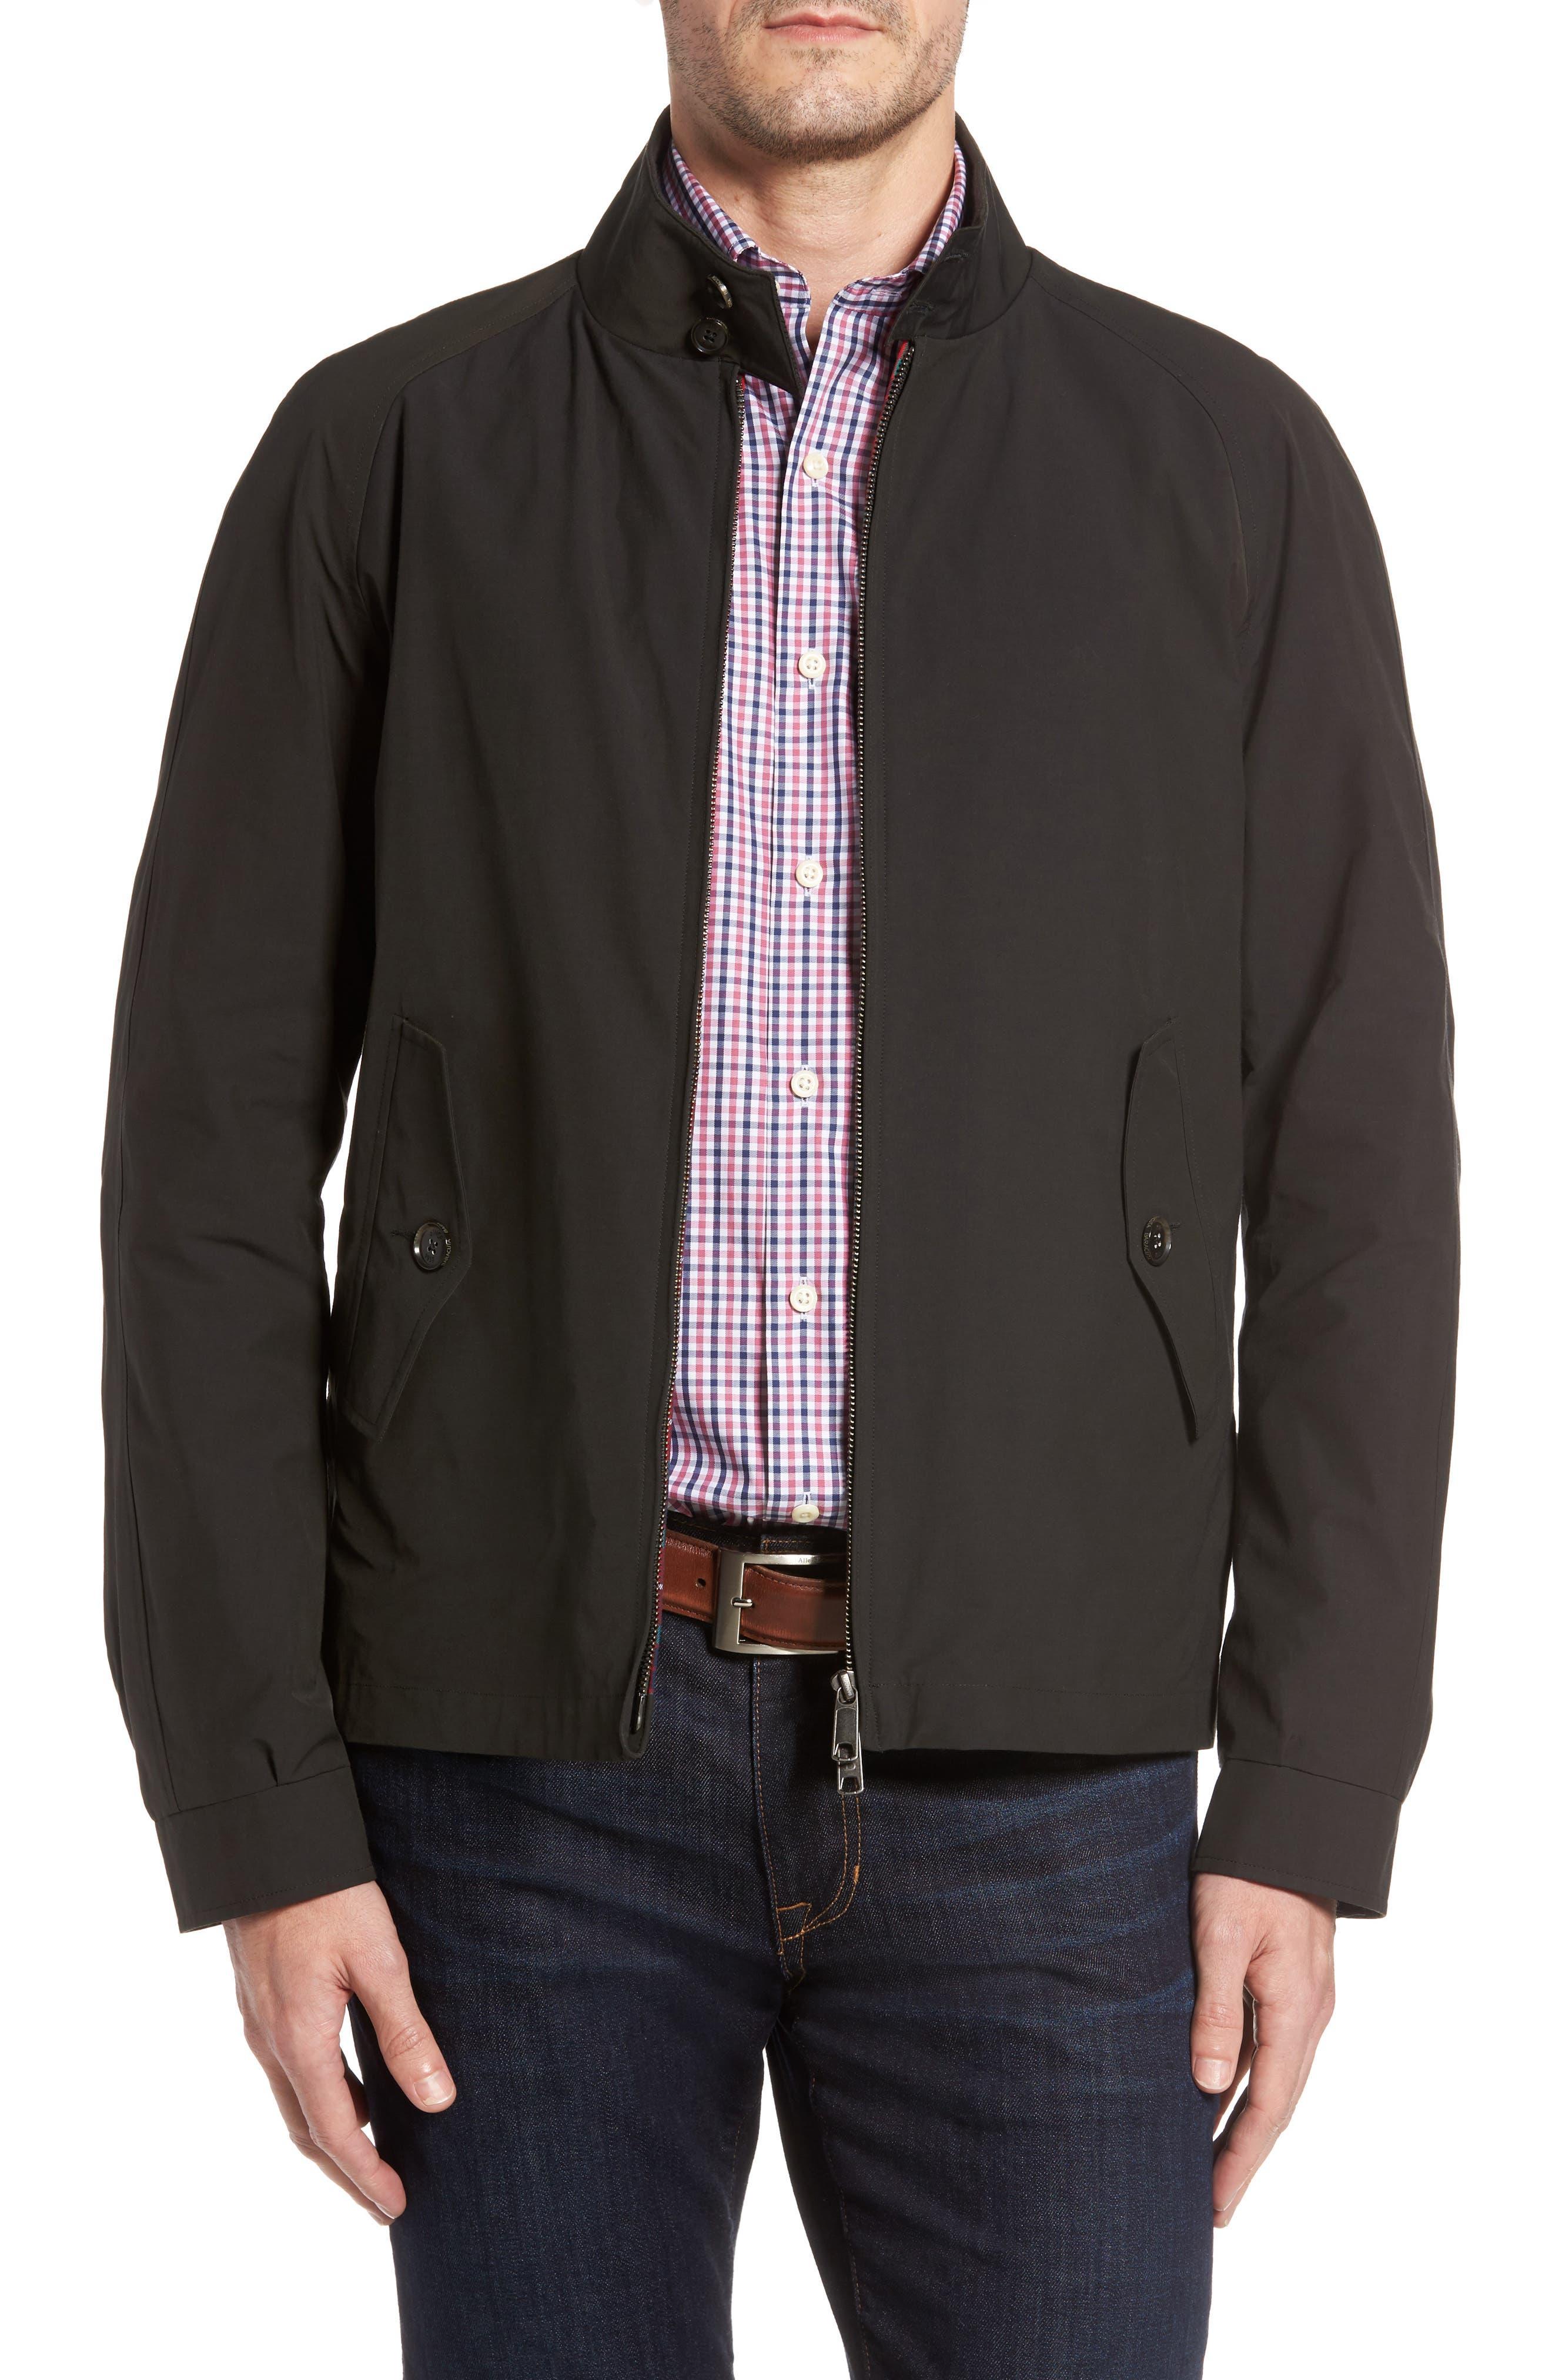 Main Image - Baracuta G4 Water Repellent Harrington Jacket